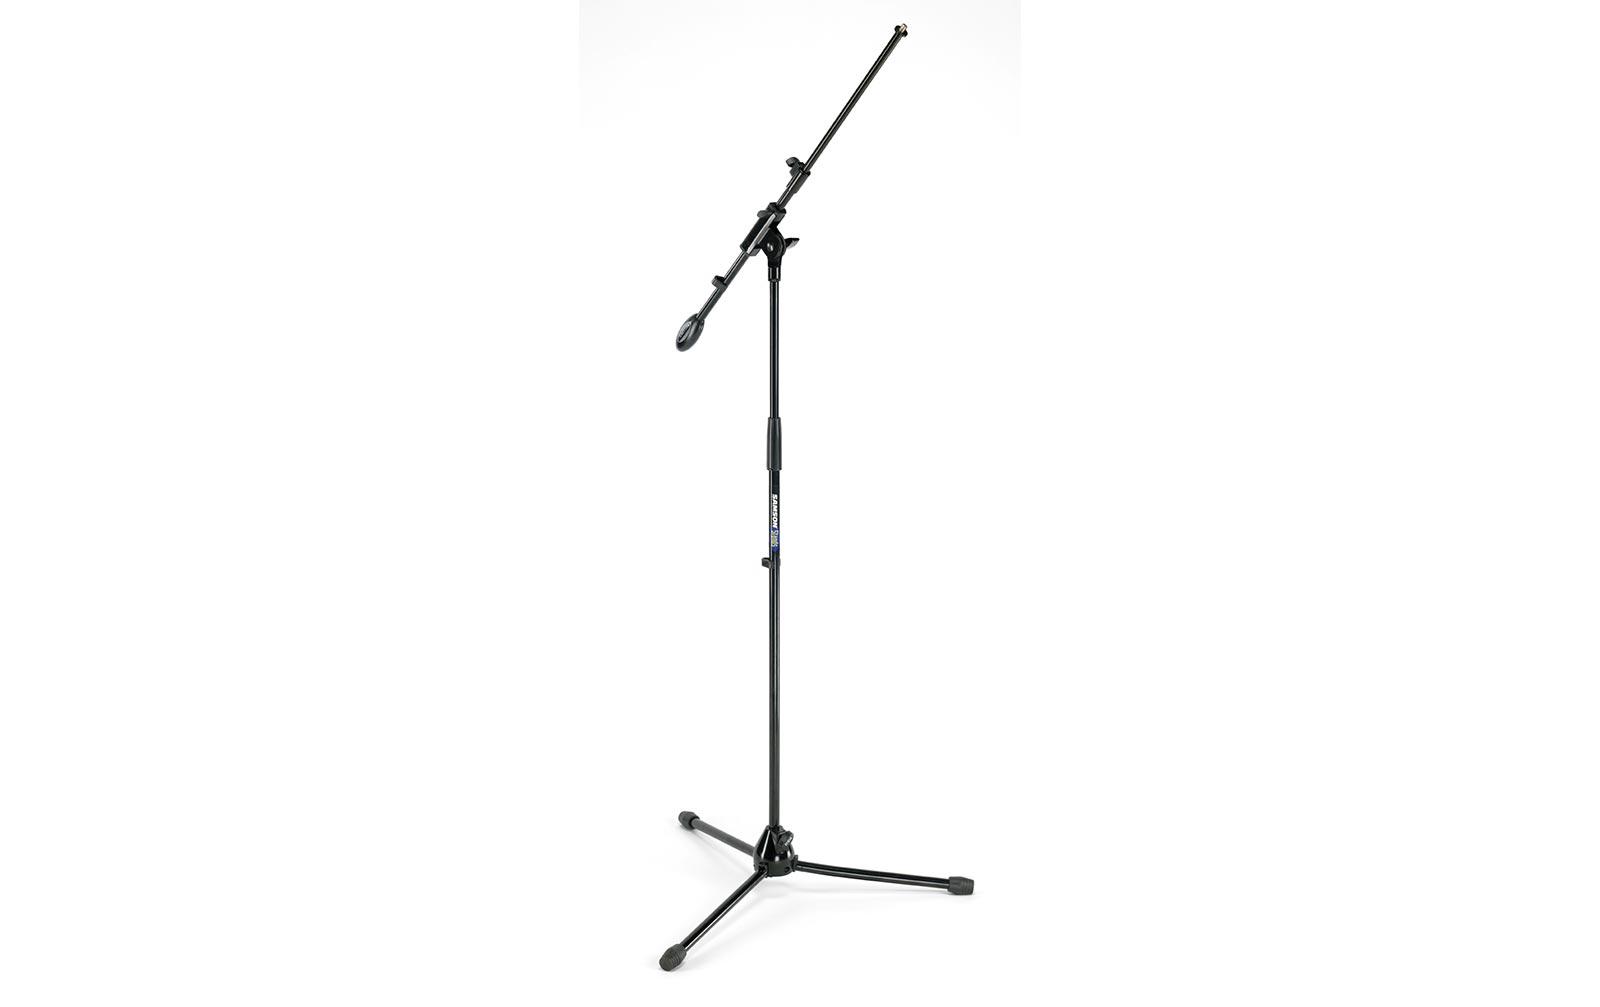 samson-bt4-mikrofon-boomstand